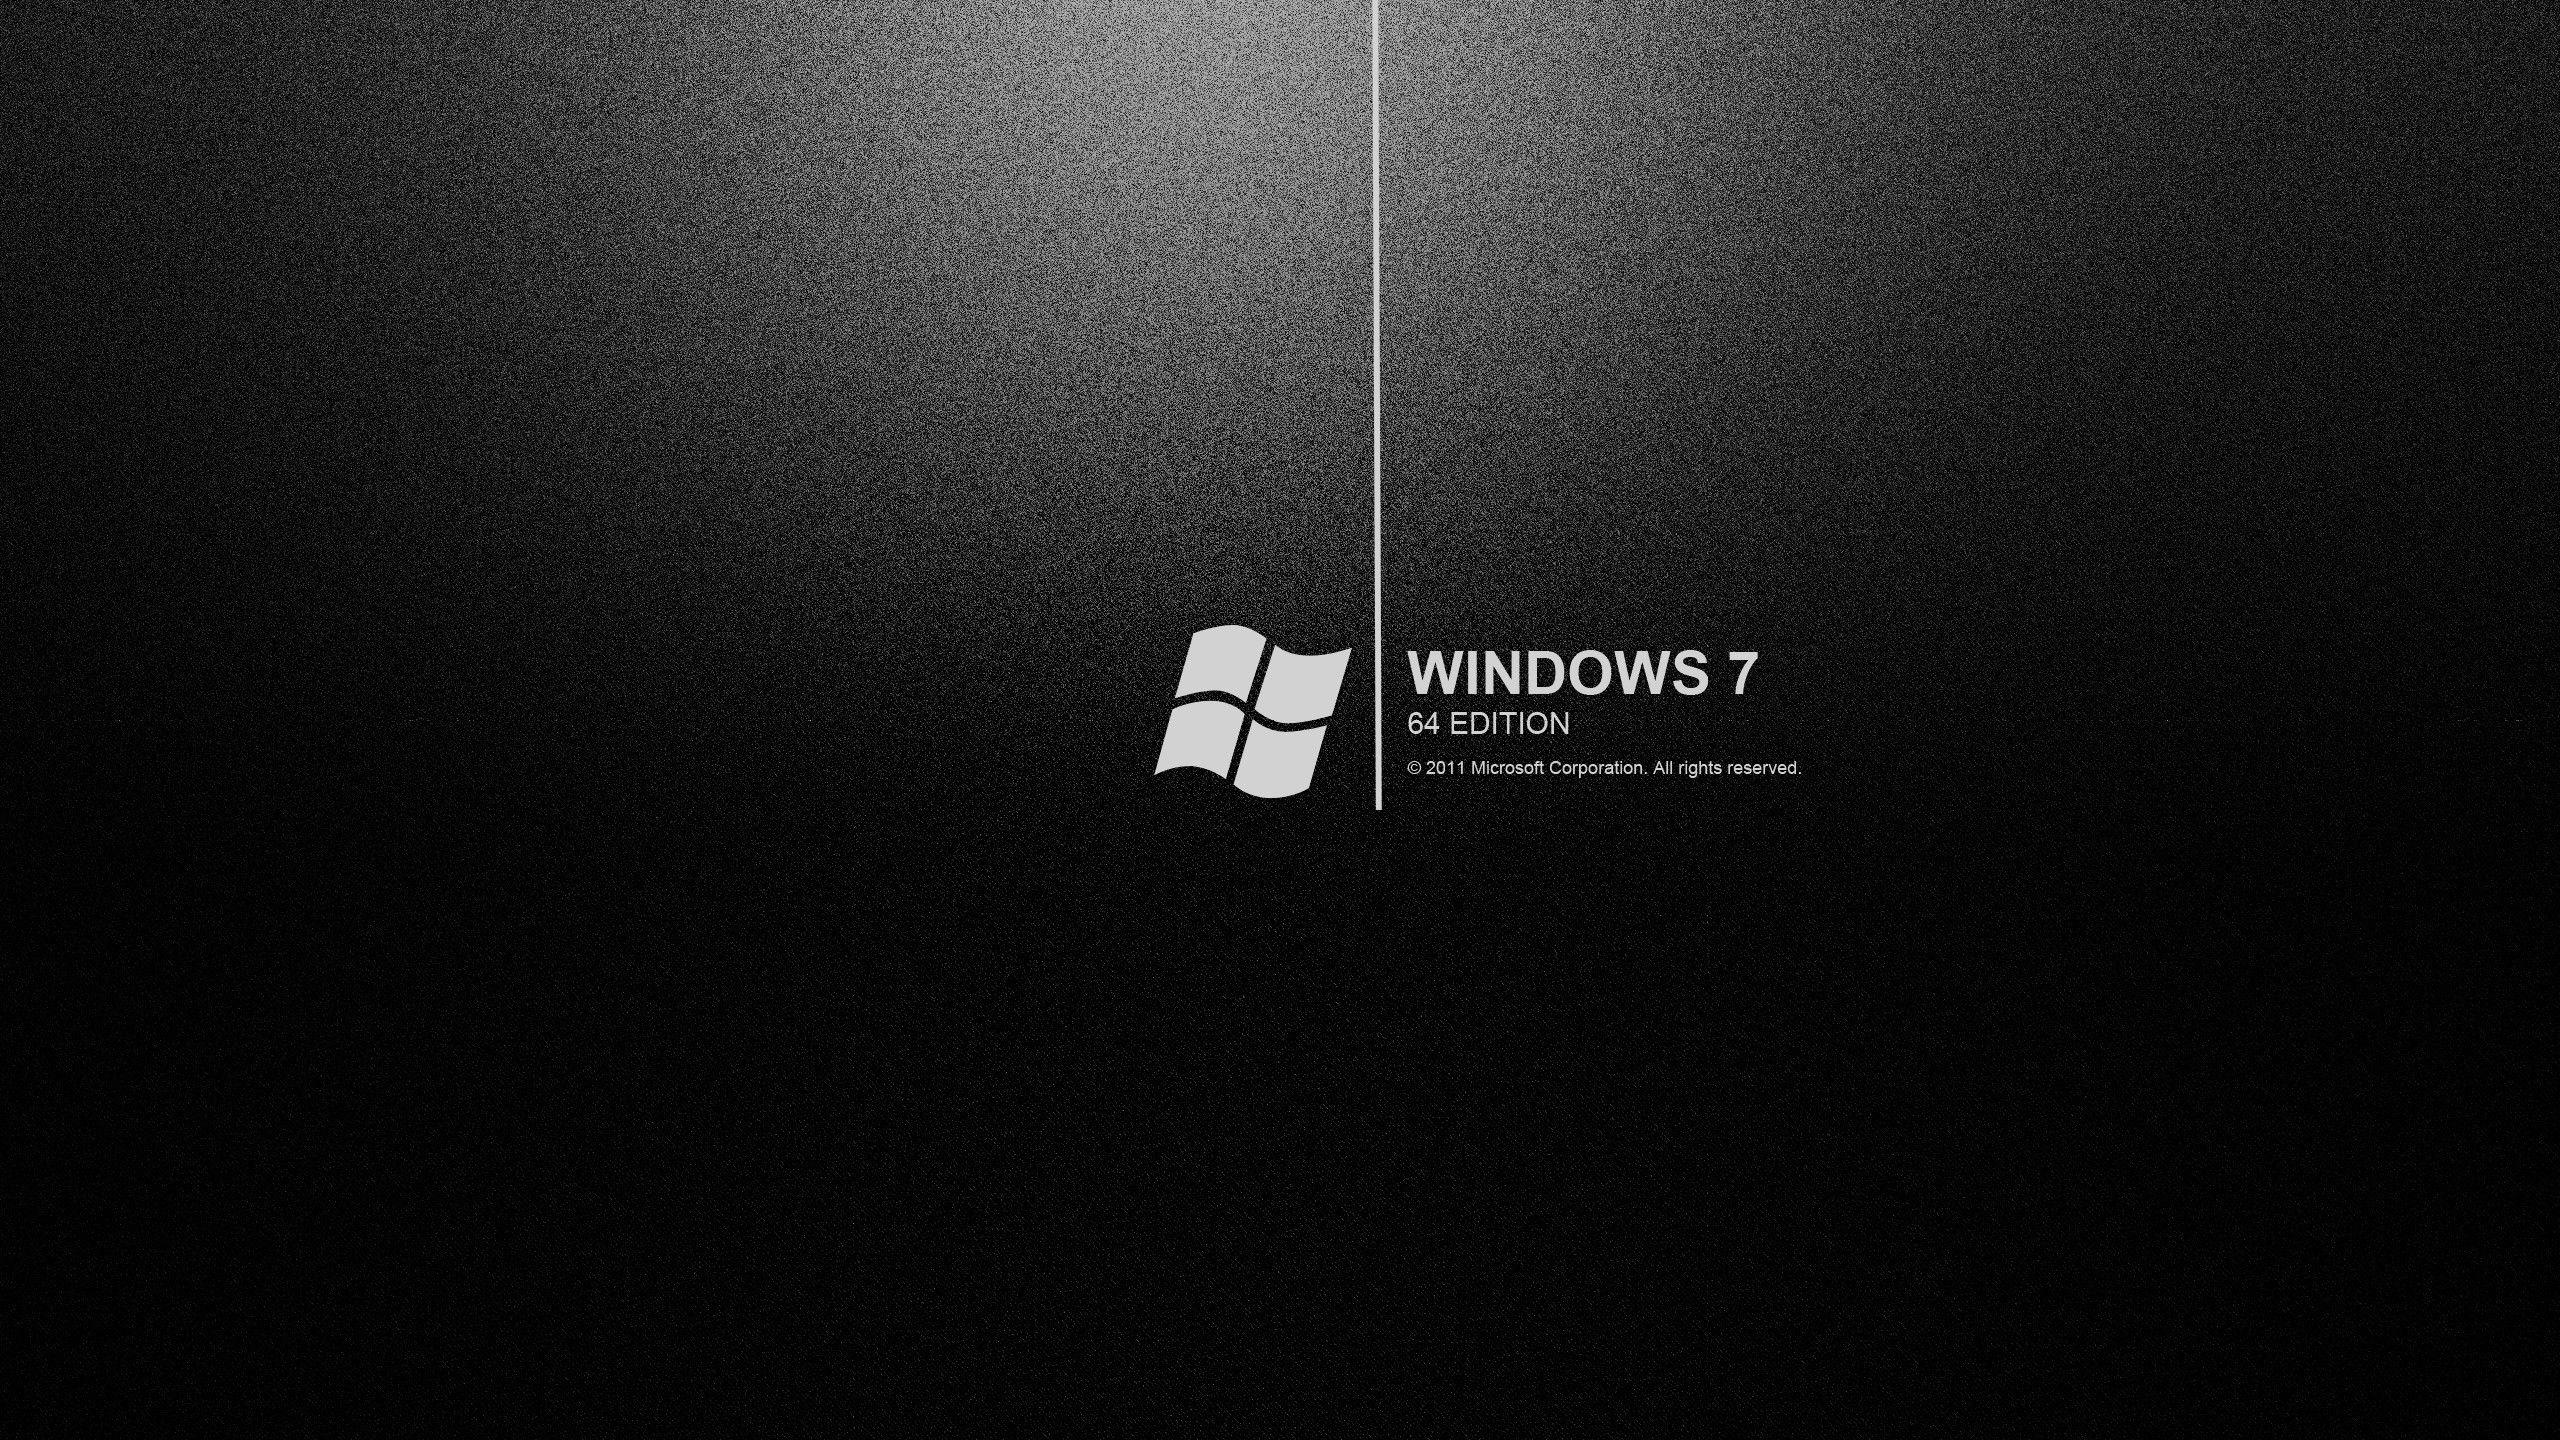 New Windows 7 Black Desktop Wallpaper Dark Wallpaper Hd Dark